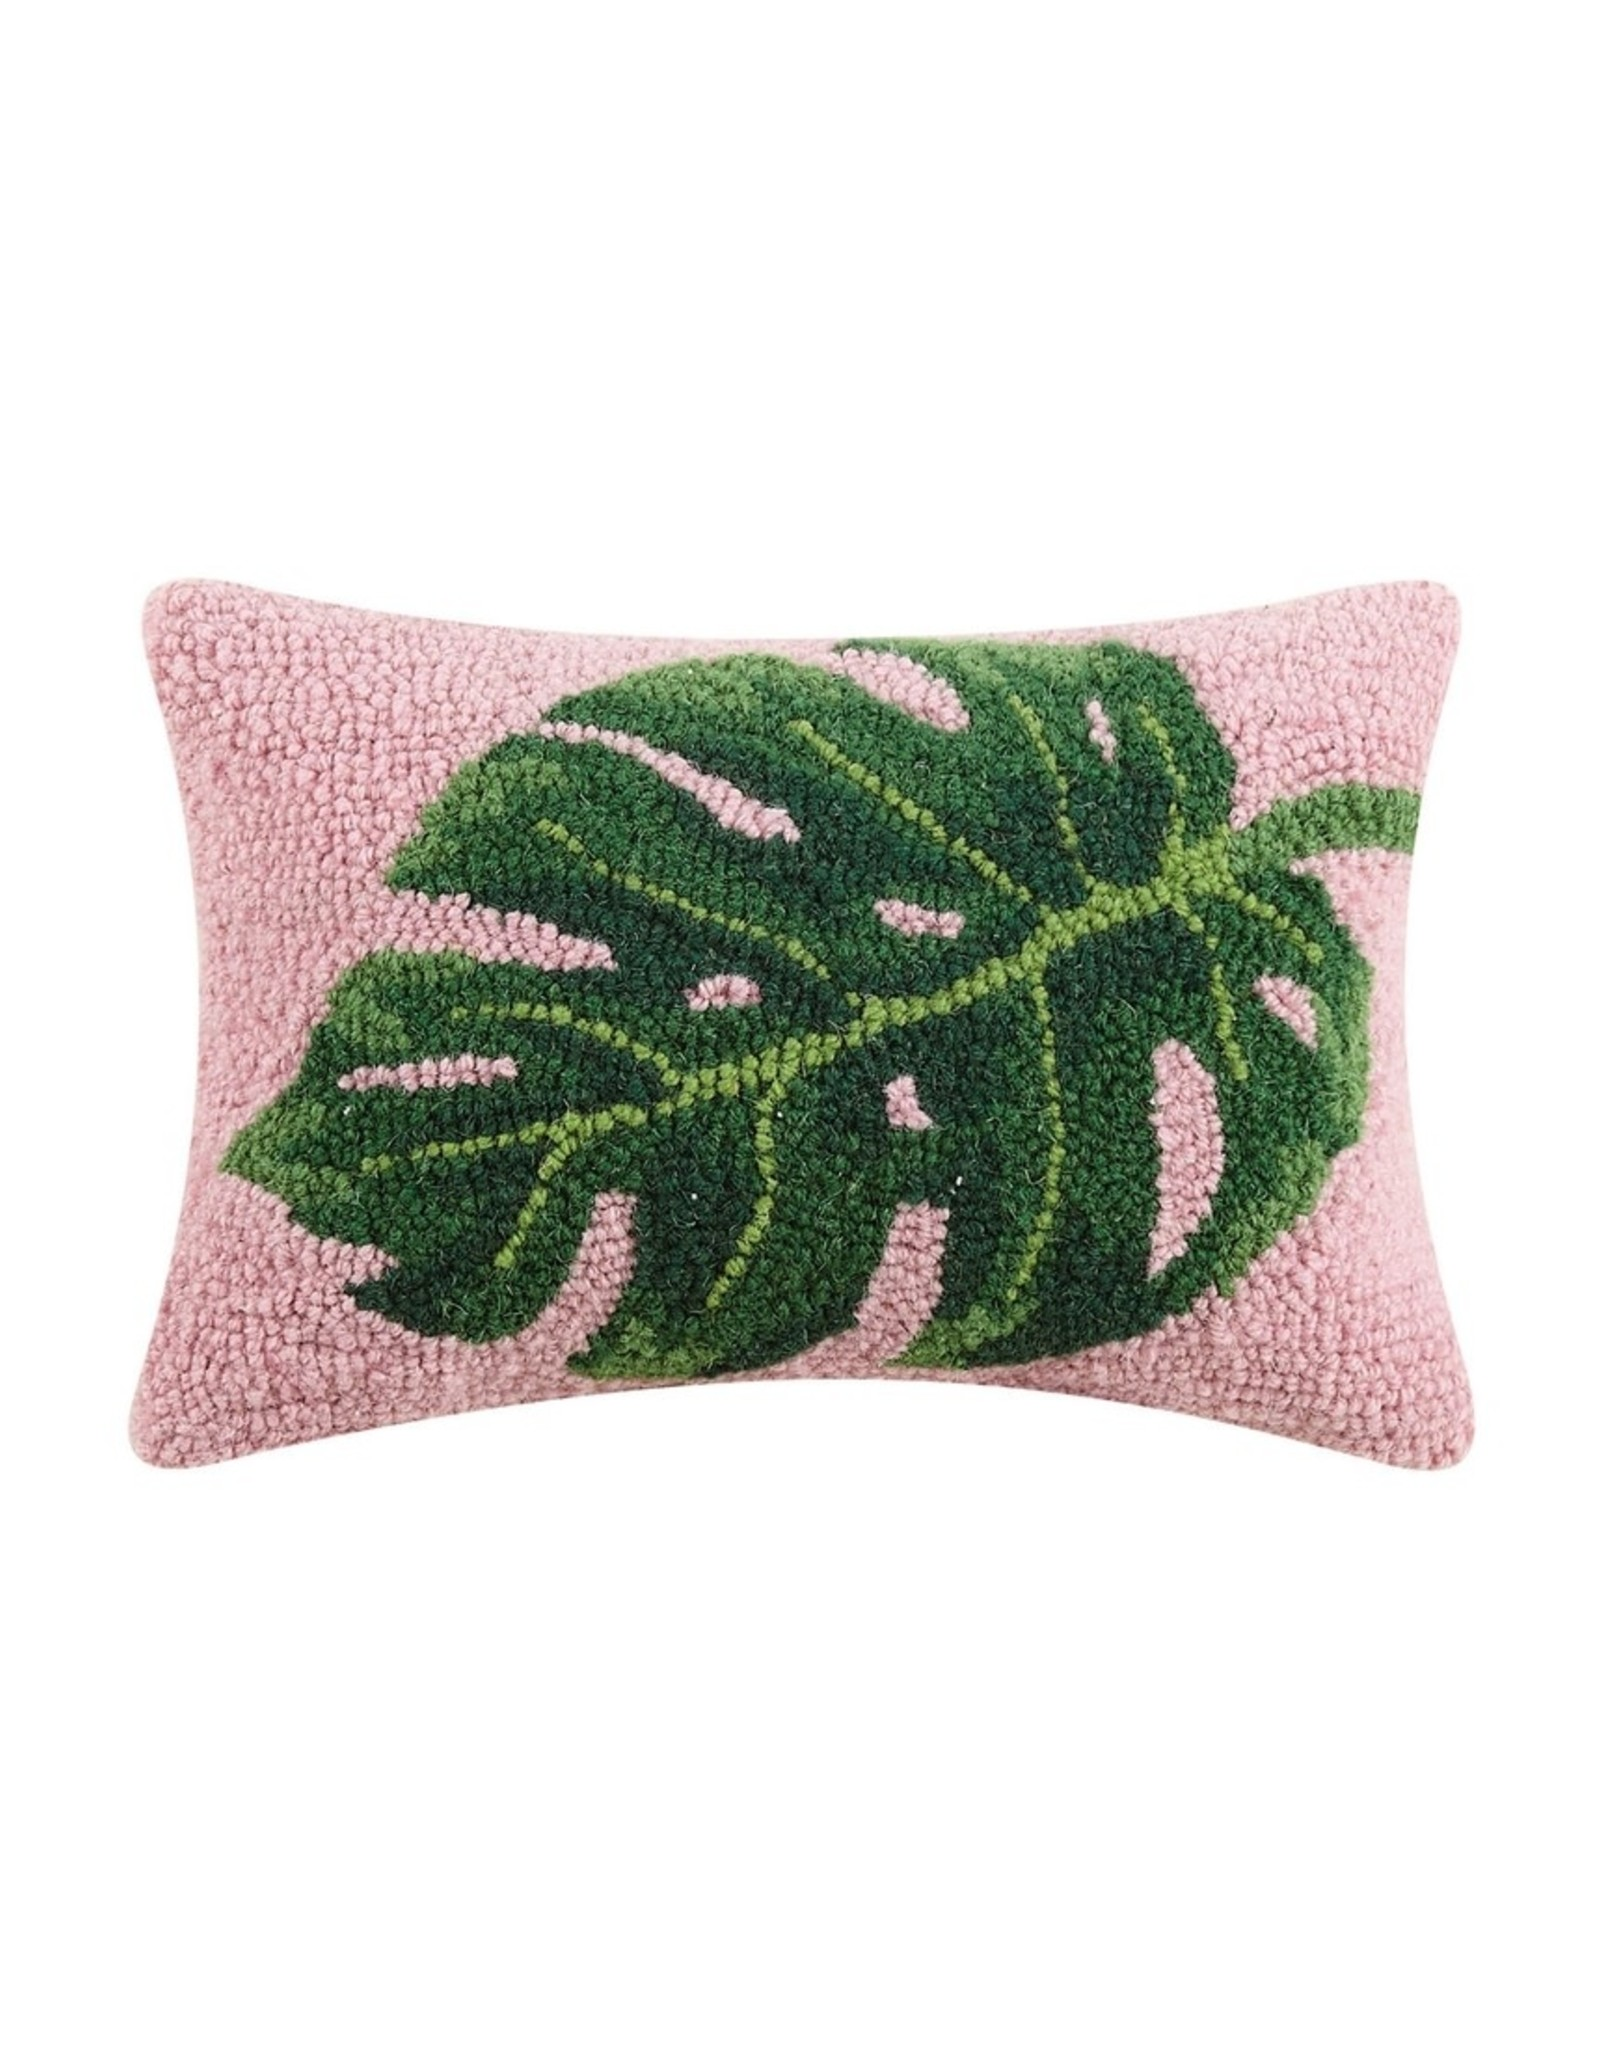 Wool Hooked Pillow - Monstera